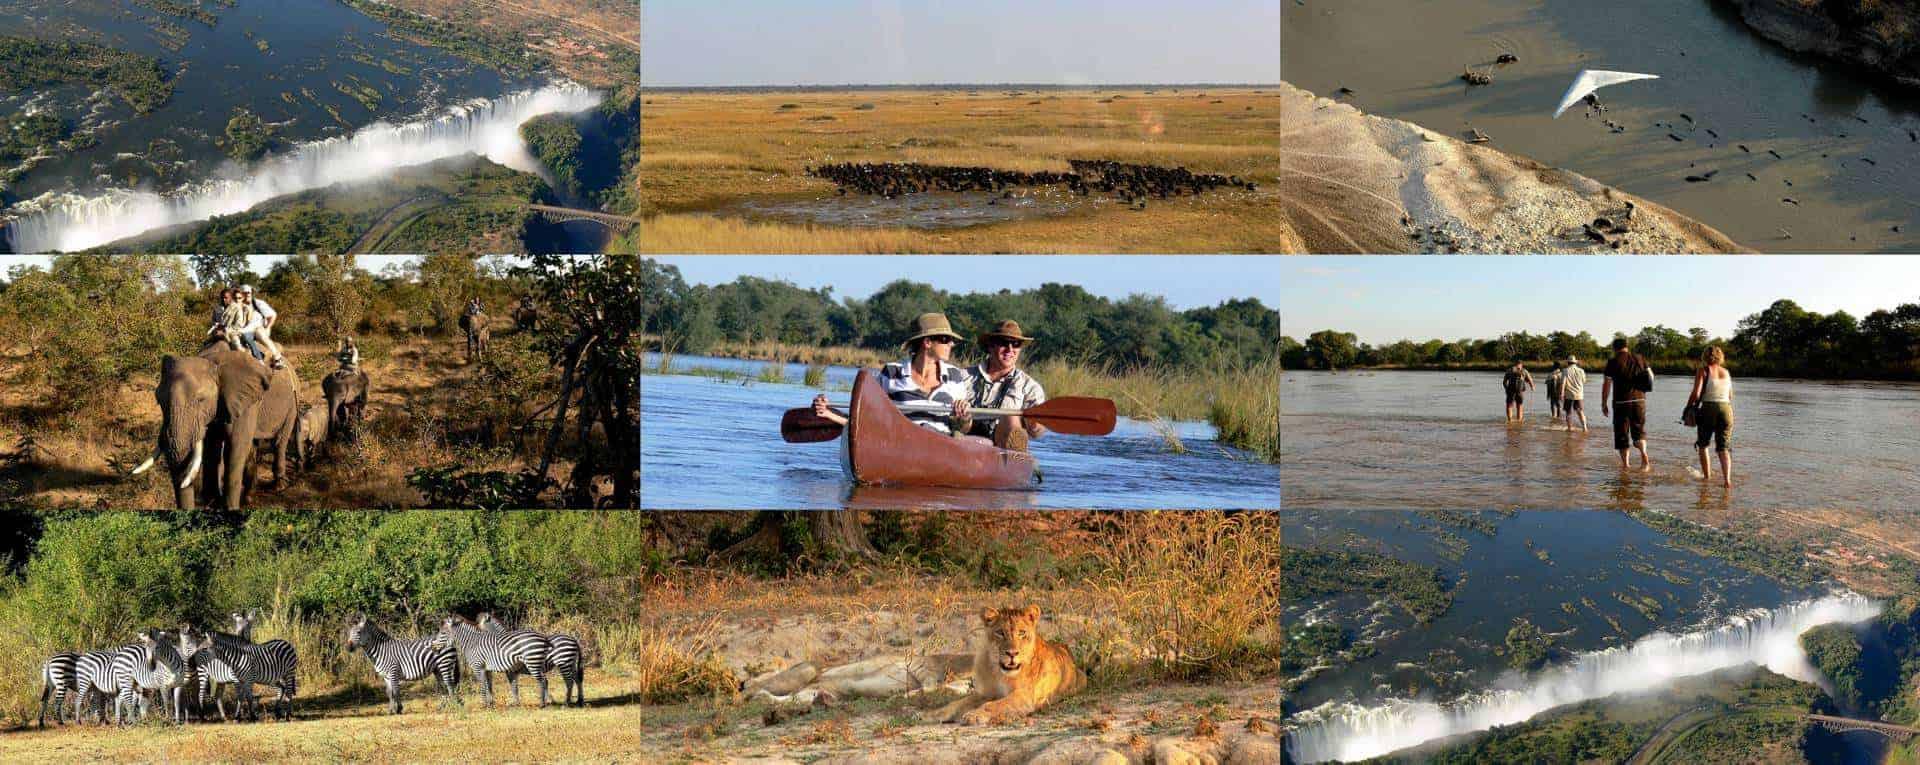 Guide to Zambia